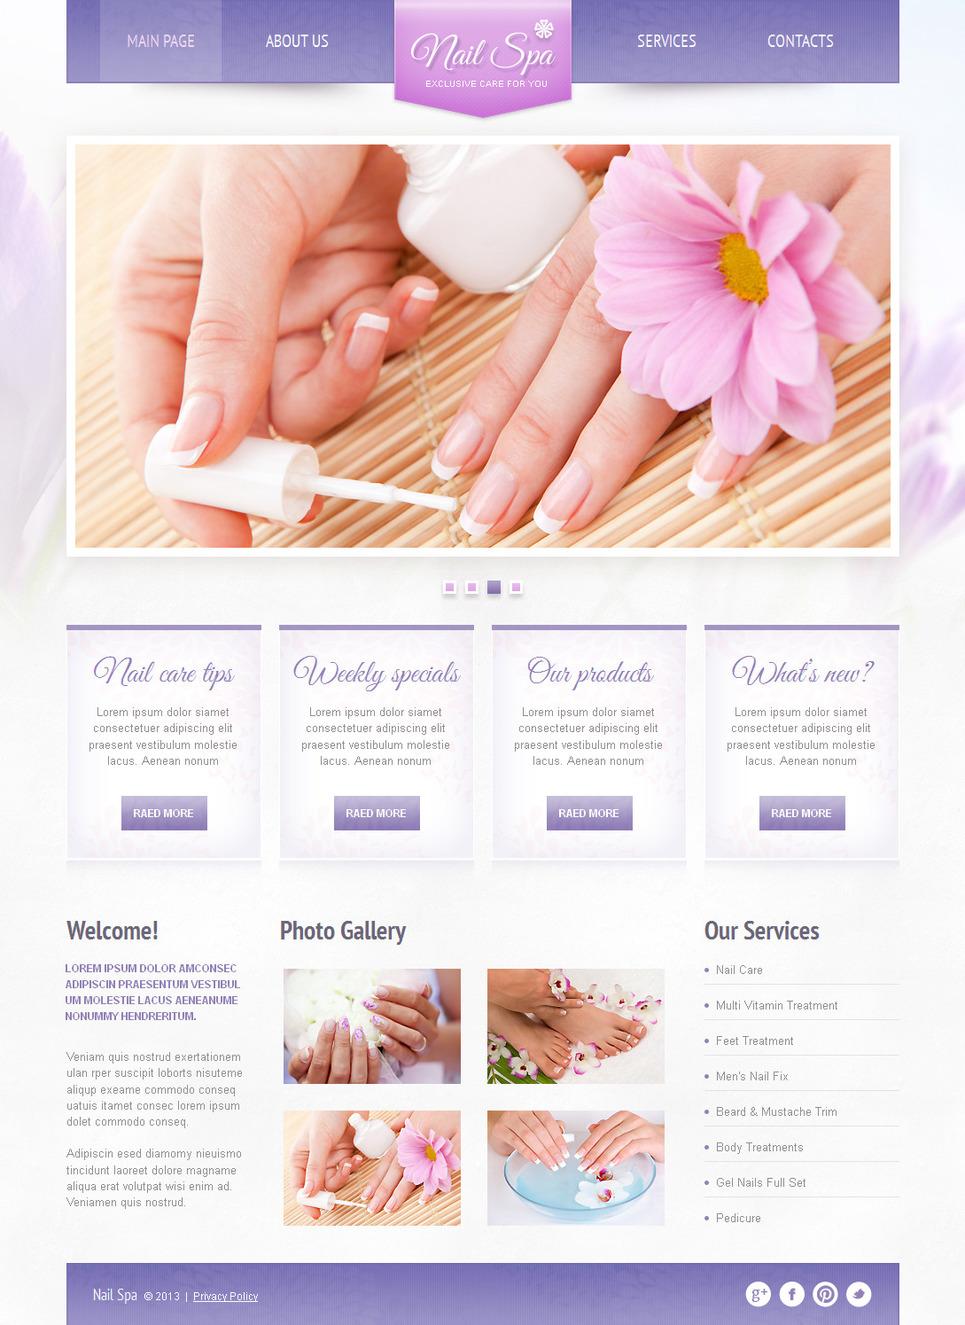 Nail Spa Website Template Designed in Light Violet Tones - image